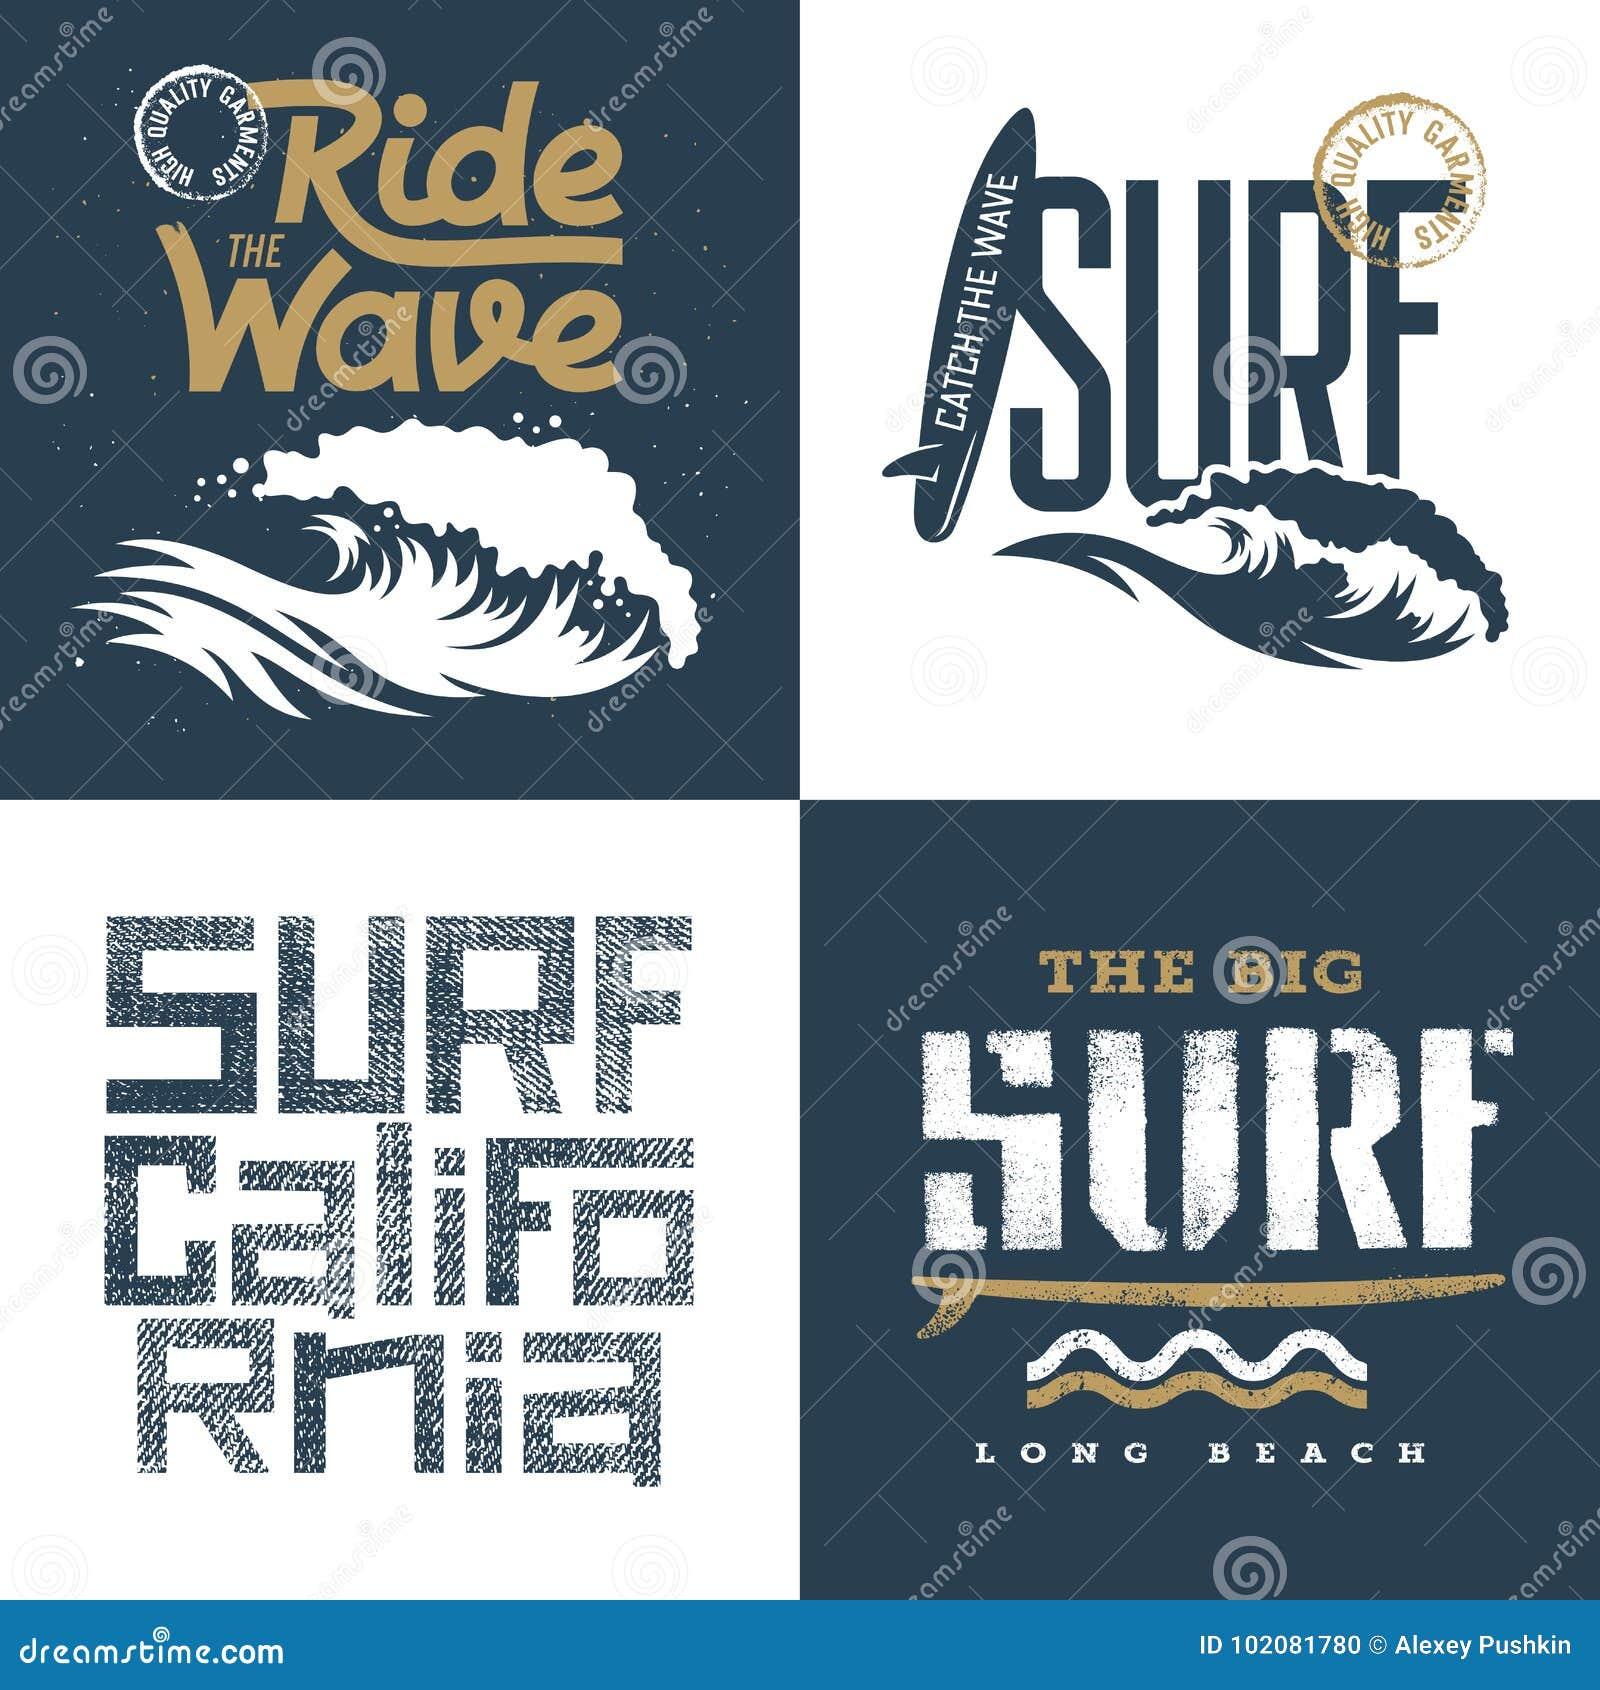 3da3cc14 Surfing artworks set / Surfrider print design / T-shirt apparel print  graphics / Original graphic Tee